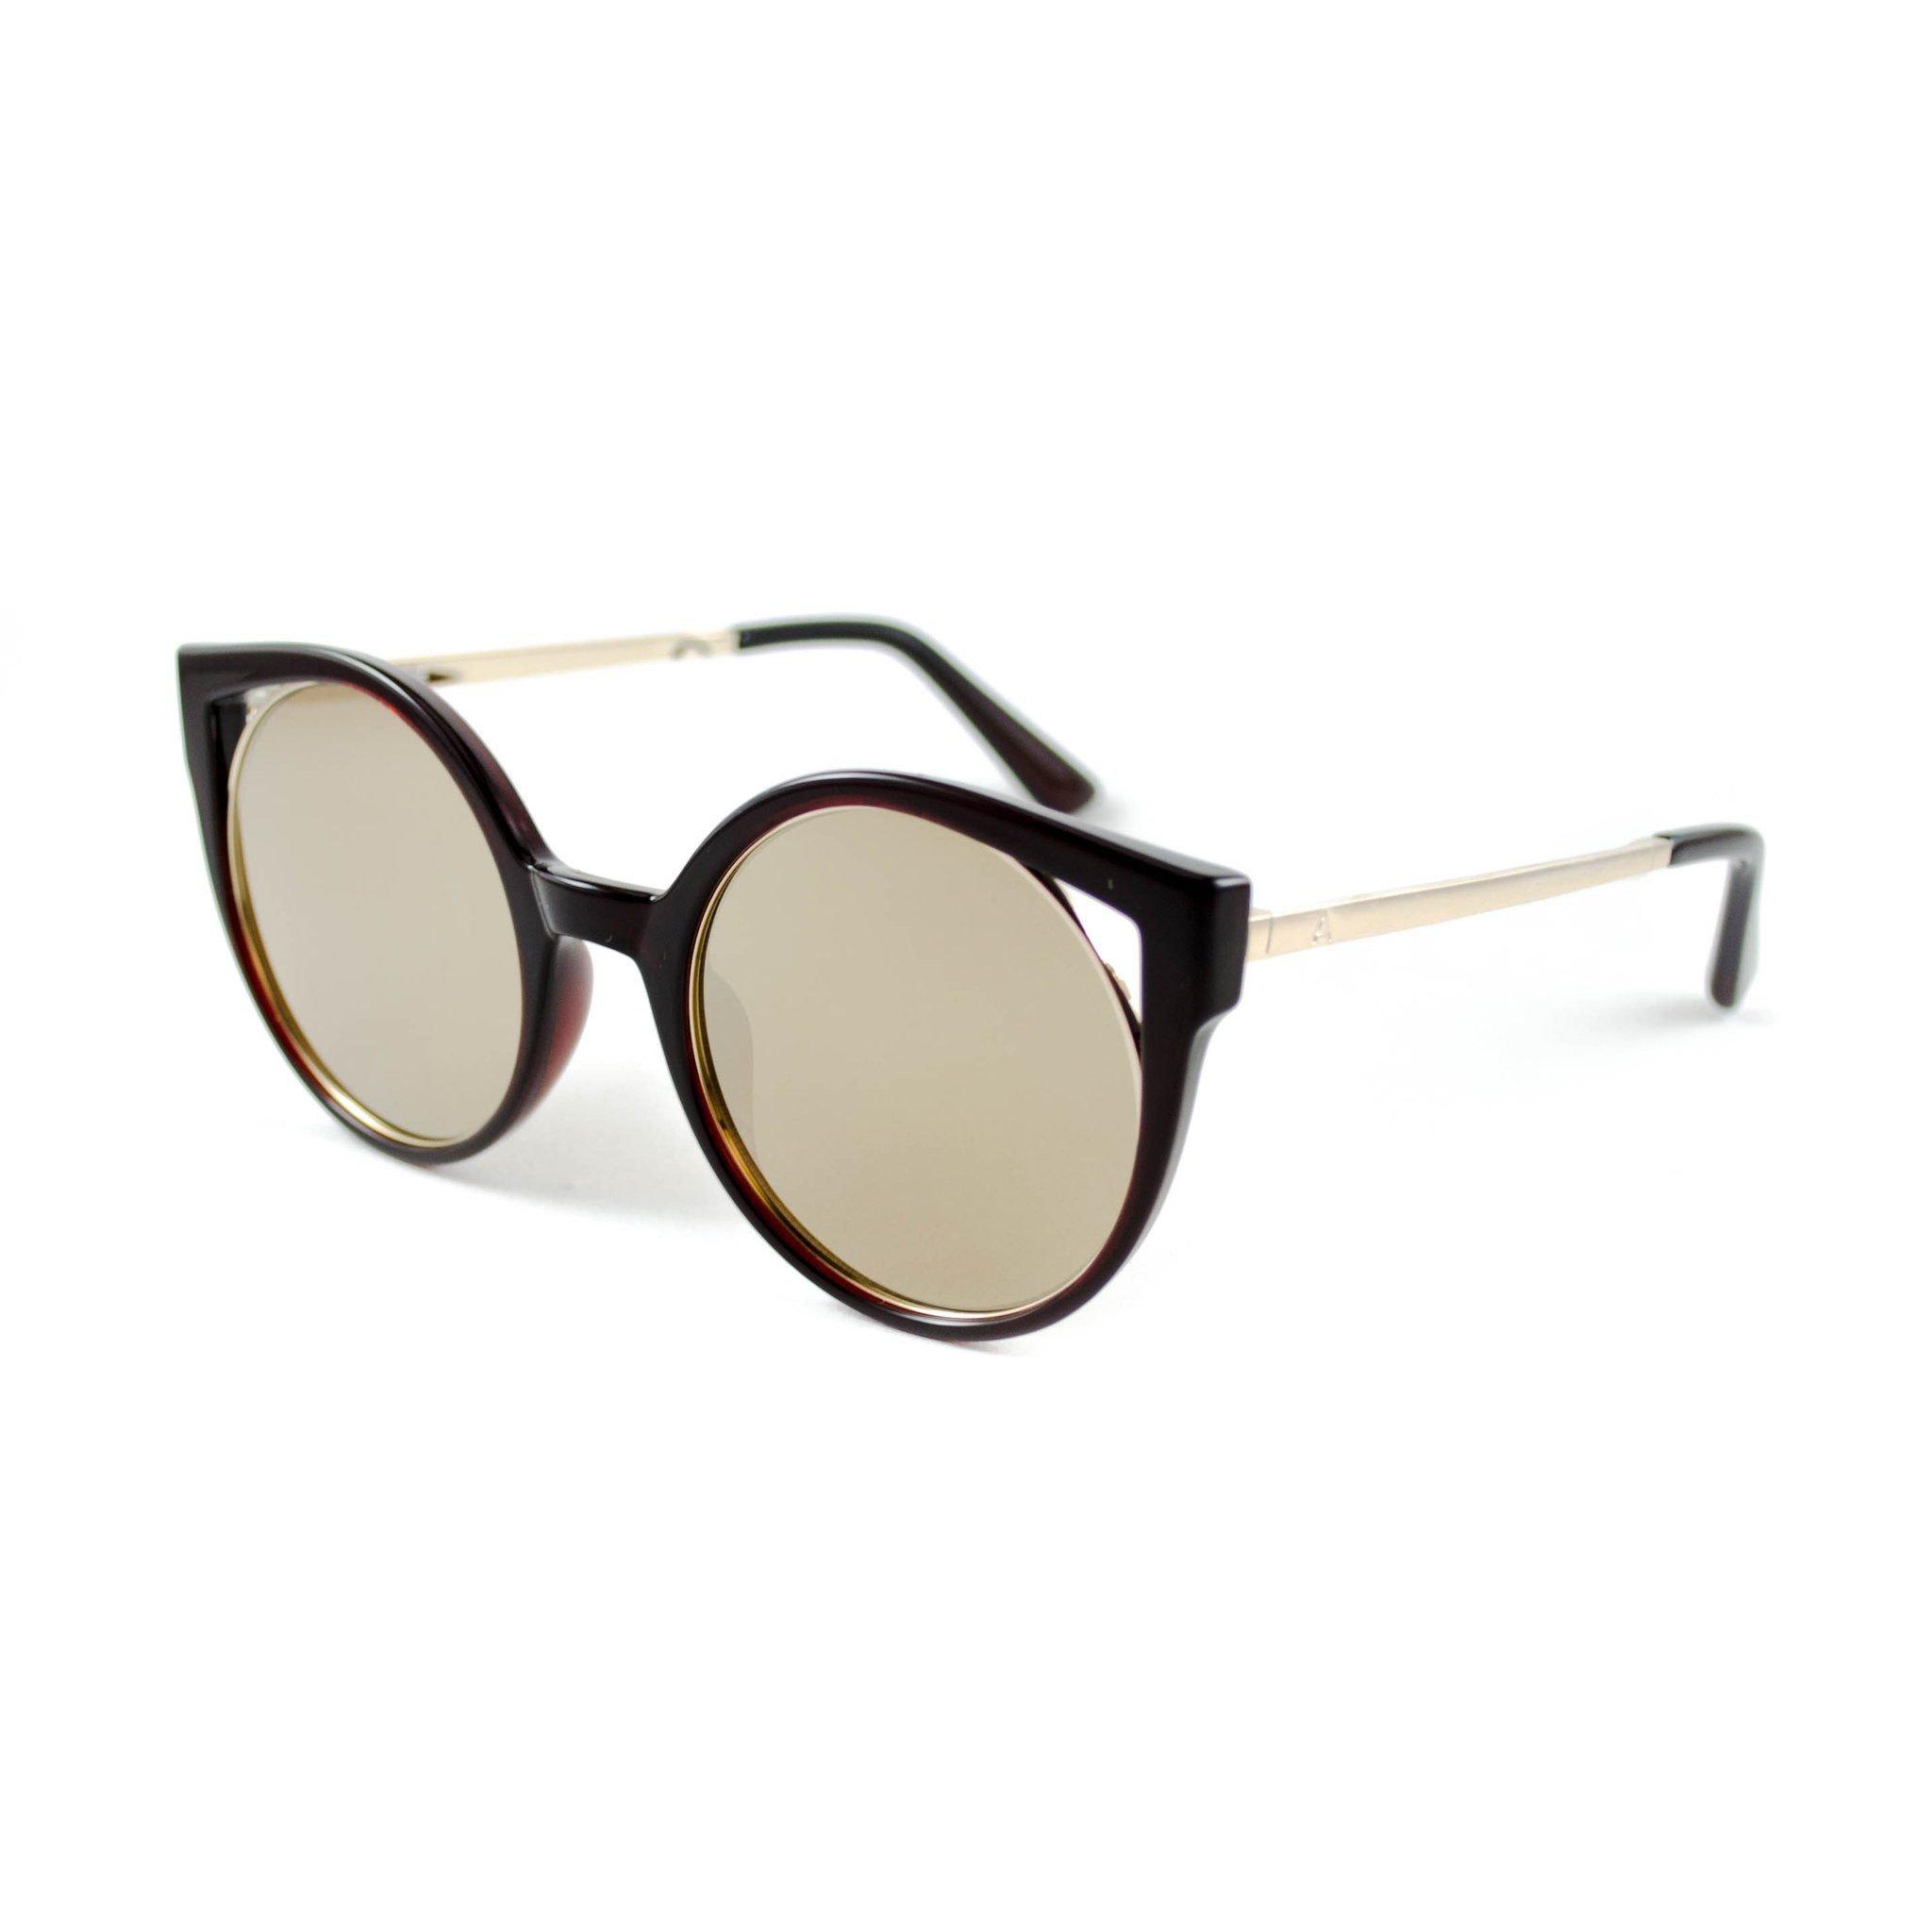 04fe63f8ecea4 Óculos de Sol Atitude AT5374-T01